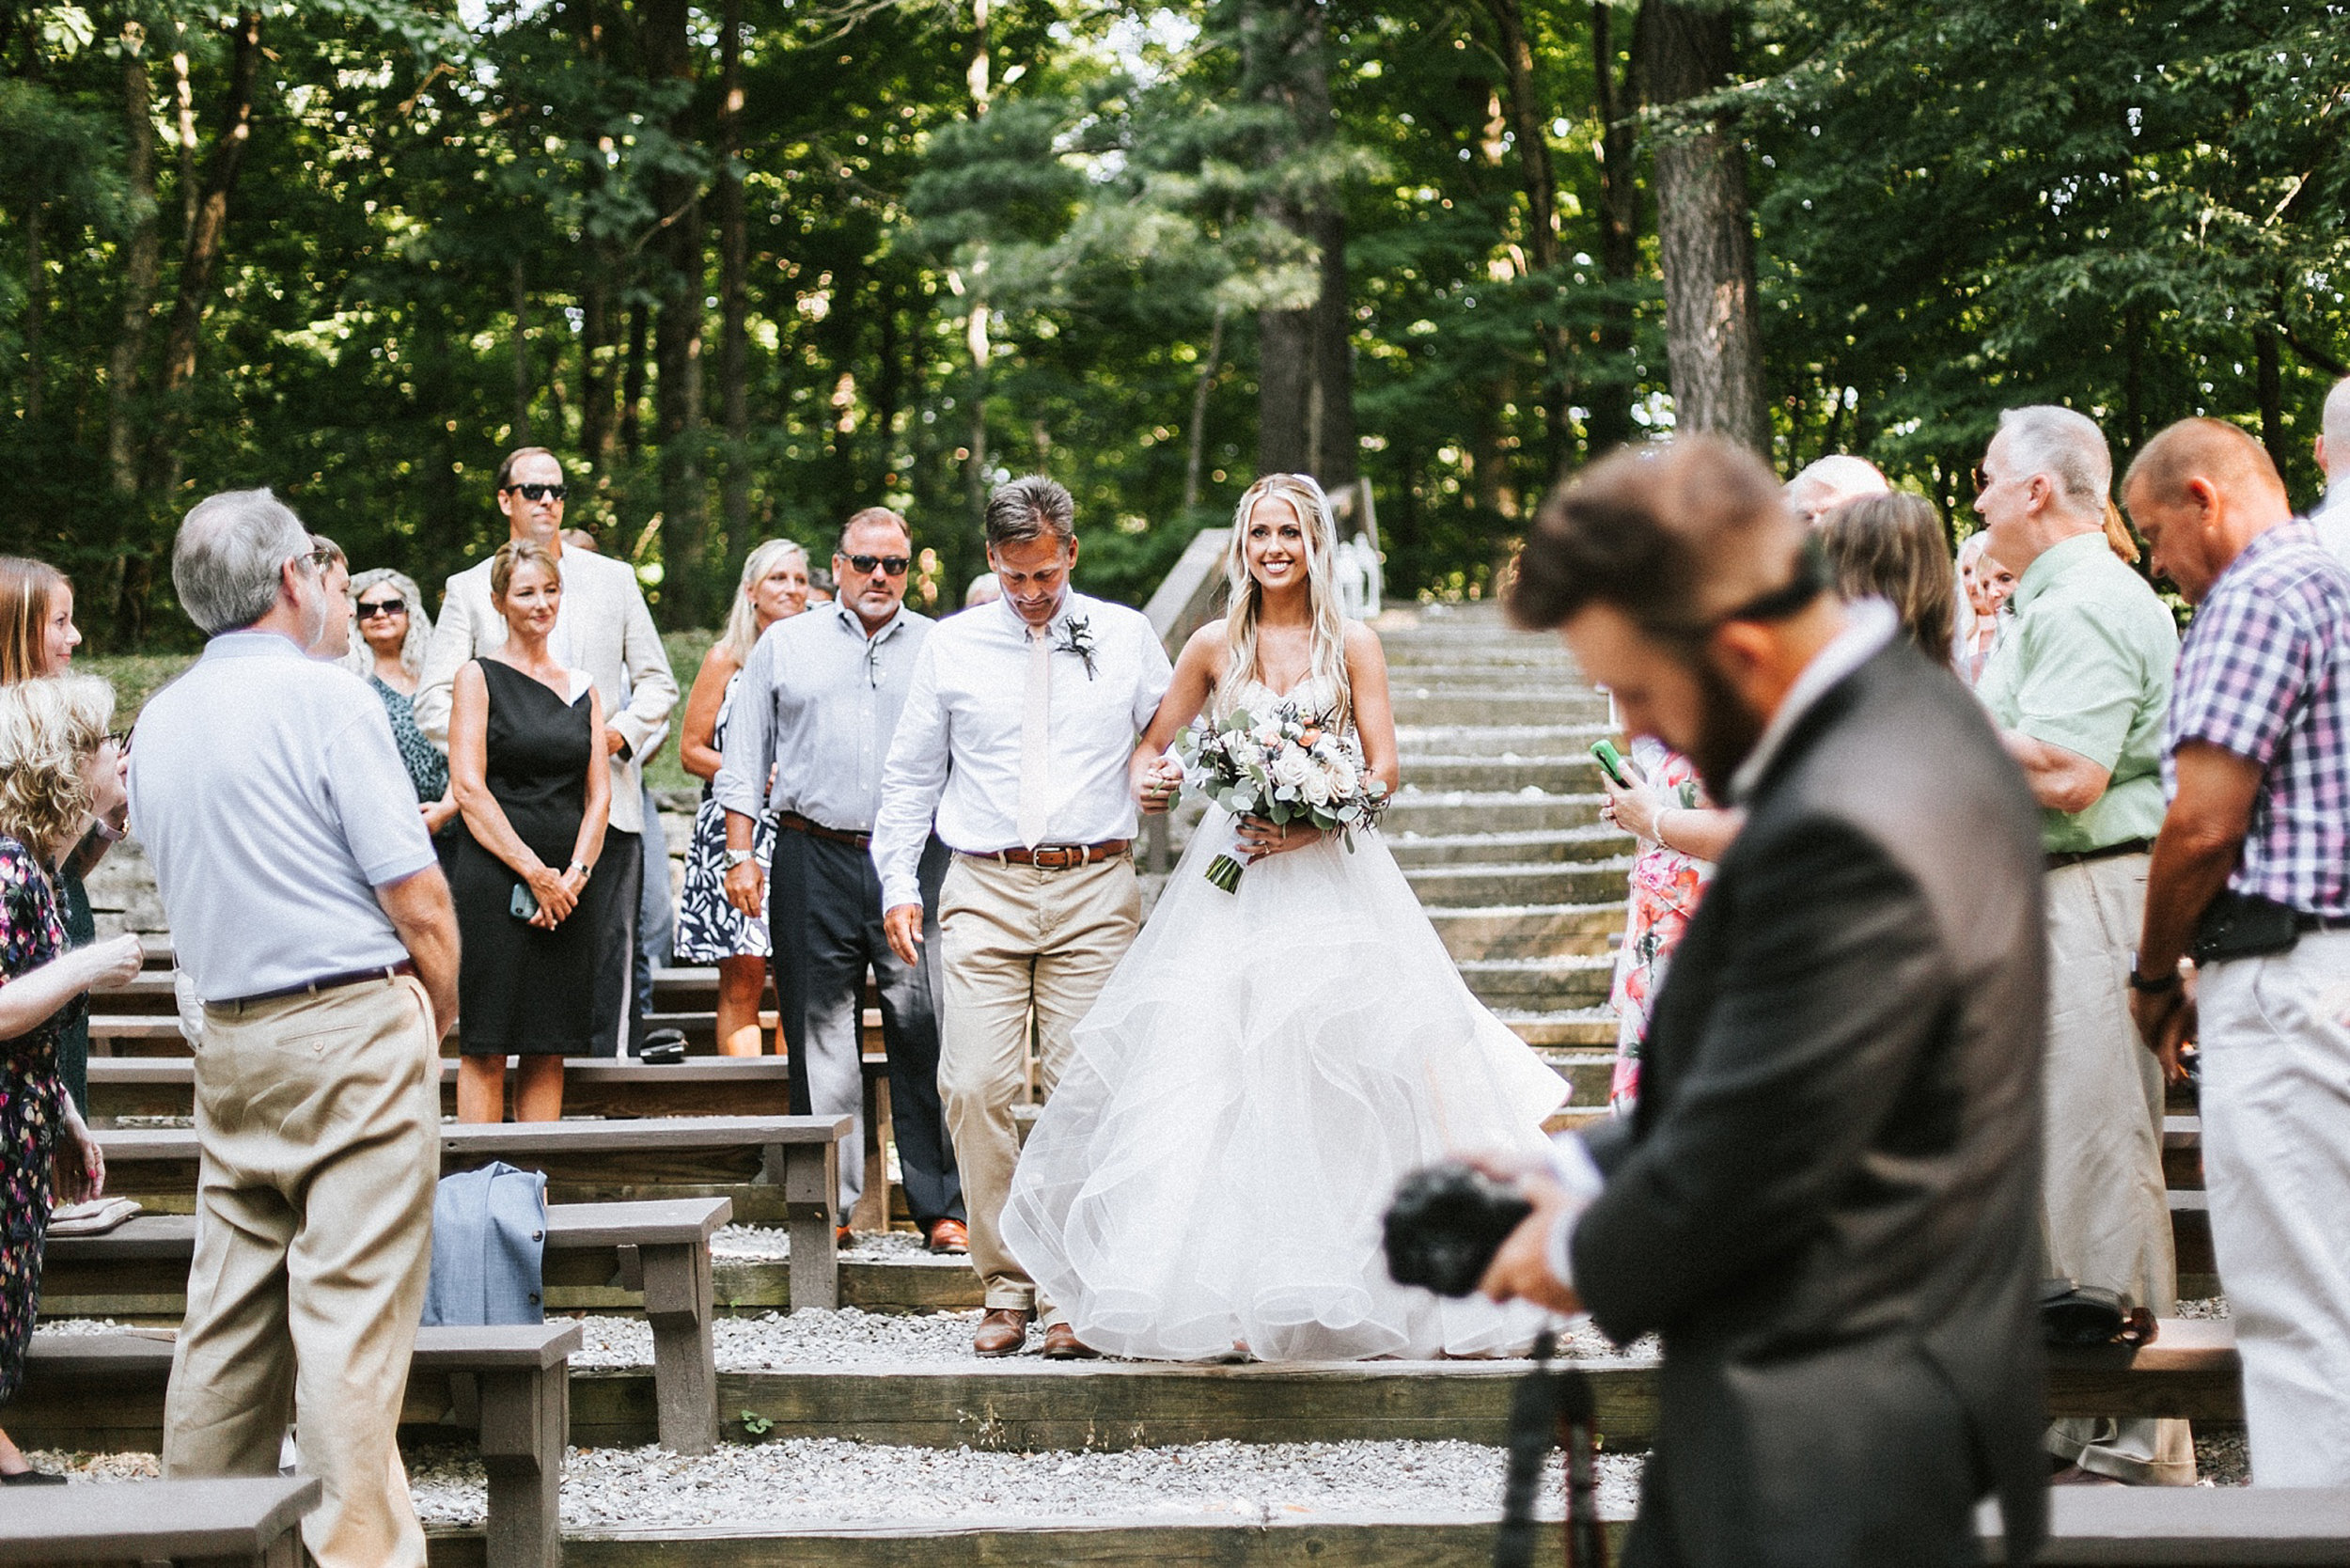 Brooke Townsend Photography - Cincinnati Wedding Photographer (65 of 153).jpg